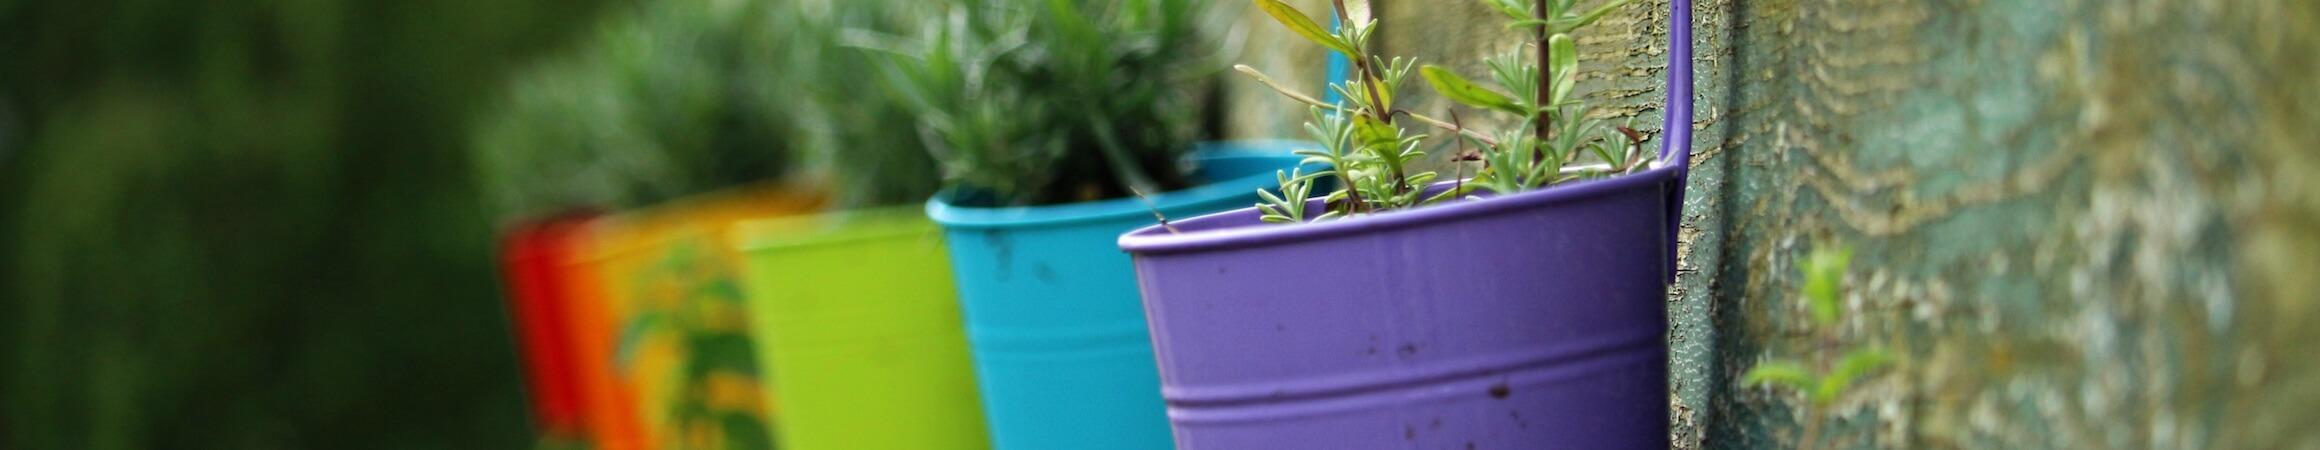 Gardening 05